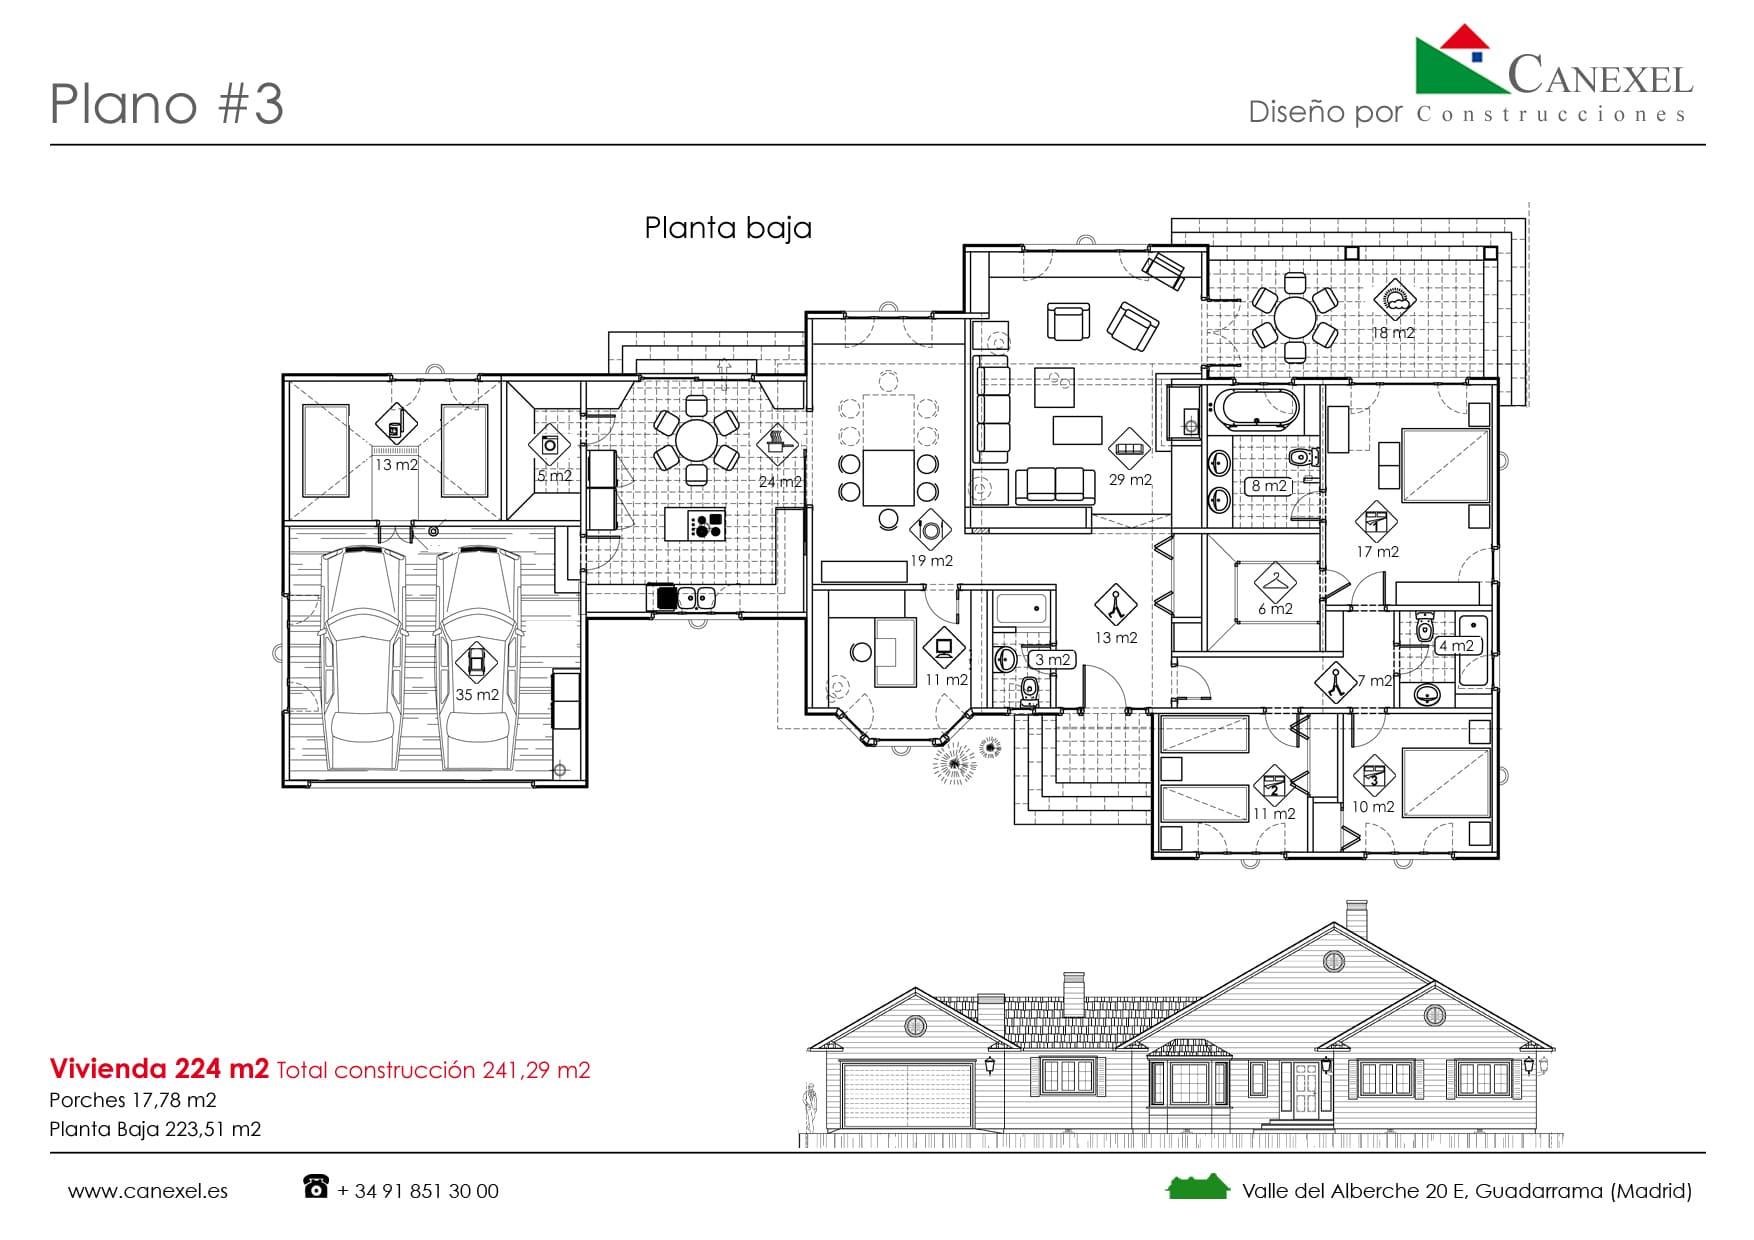 Planos de casas de una planta canexel for Diseno de casa de 7 x 17